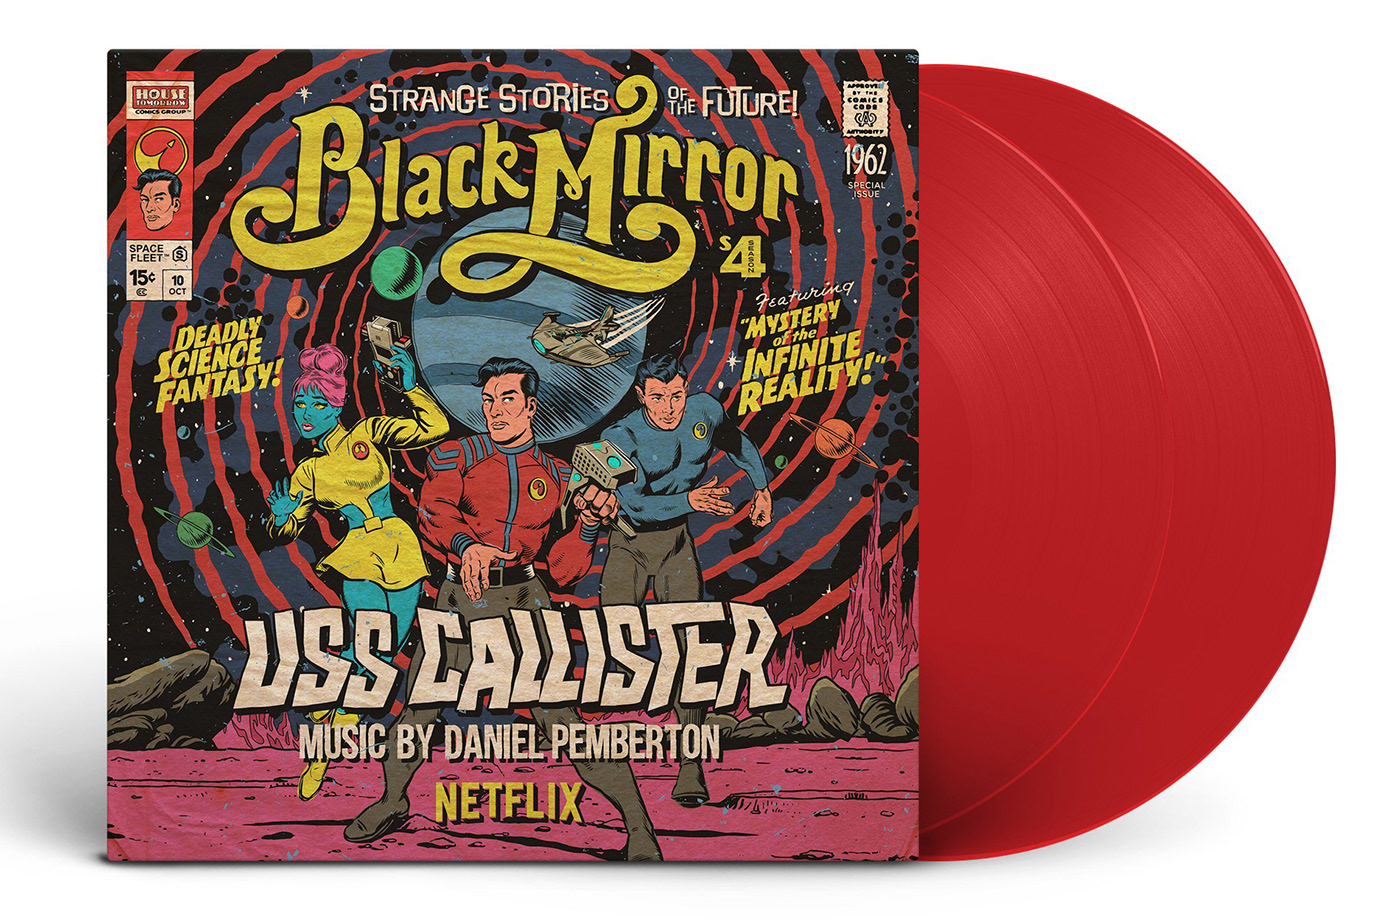 black mirror Netflix Charlie Brooker uss callister Streaming vinyl sleeve space fleet Original series